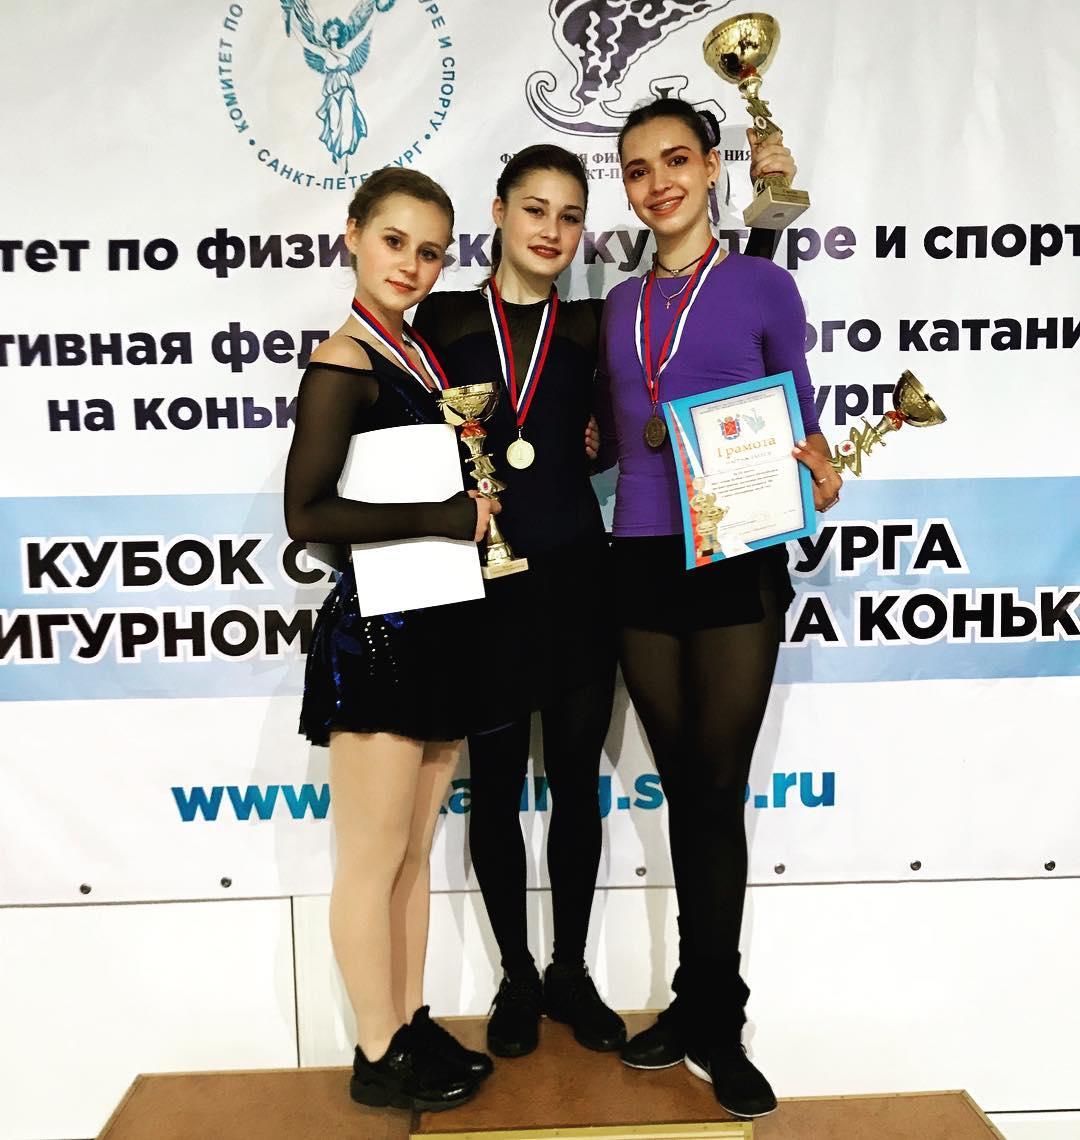 Анастасия Гулякова - Страница 2 V4B4yIlbWk4